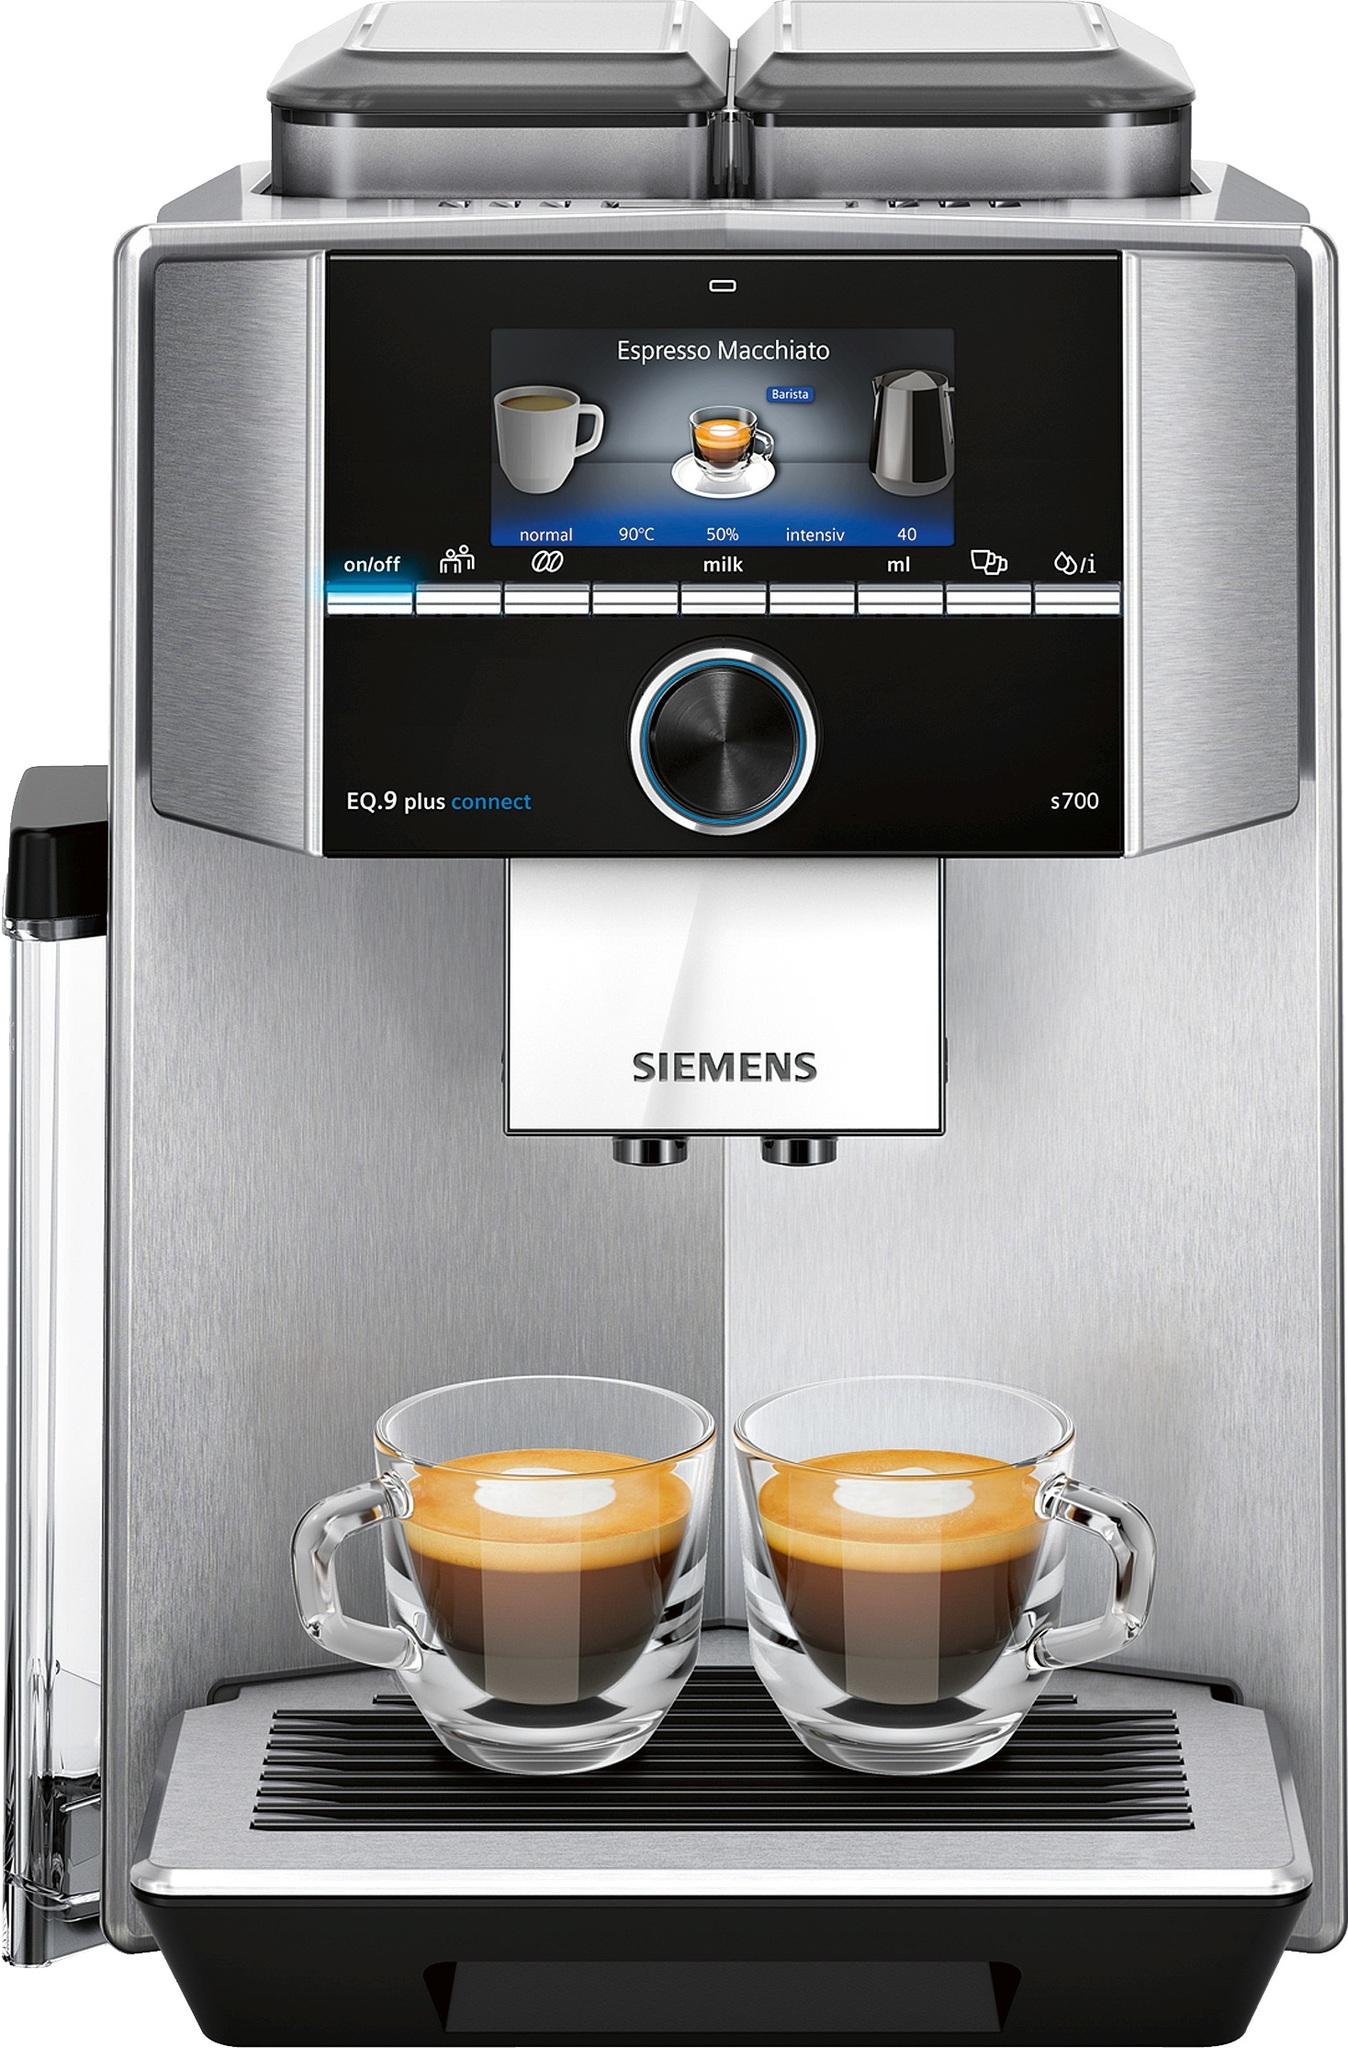 Siemens Kaffeevollautomat EQ.9 plus connect s700 extraKLASSE Chrom Hochglanz